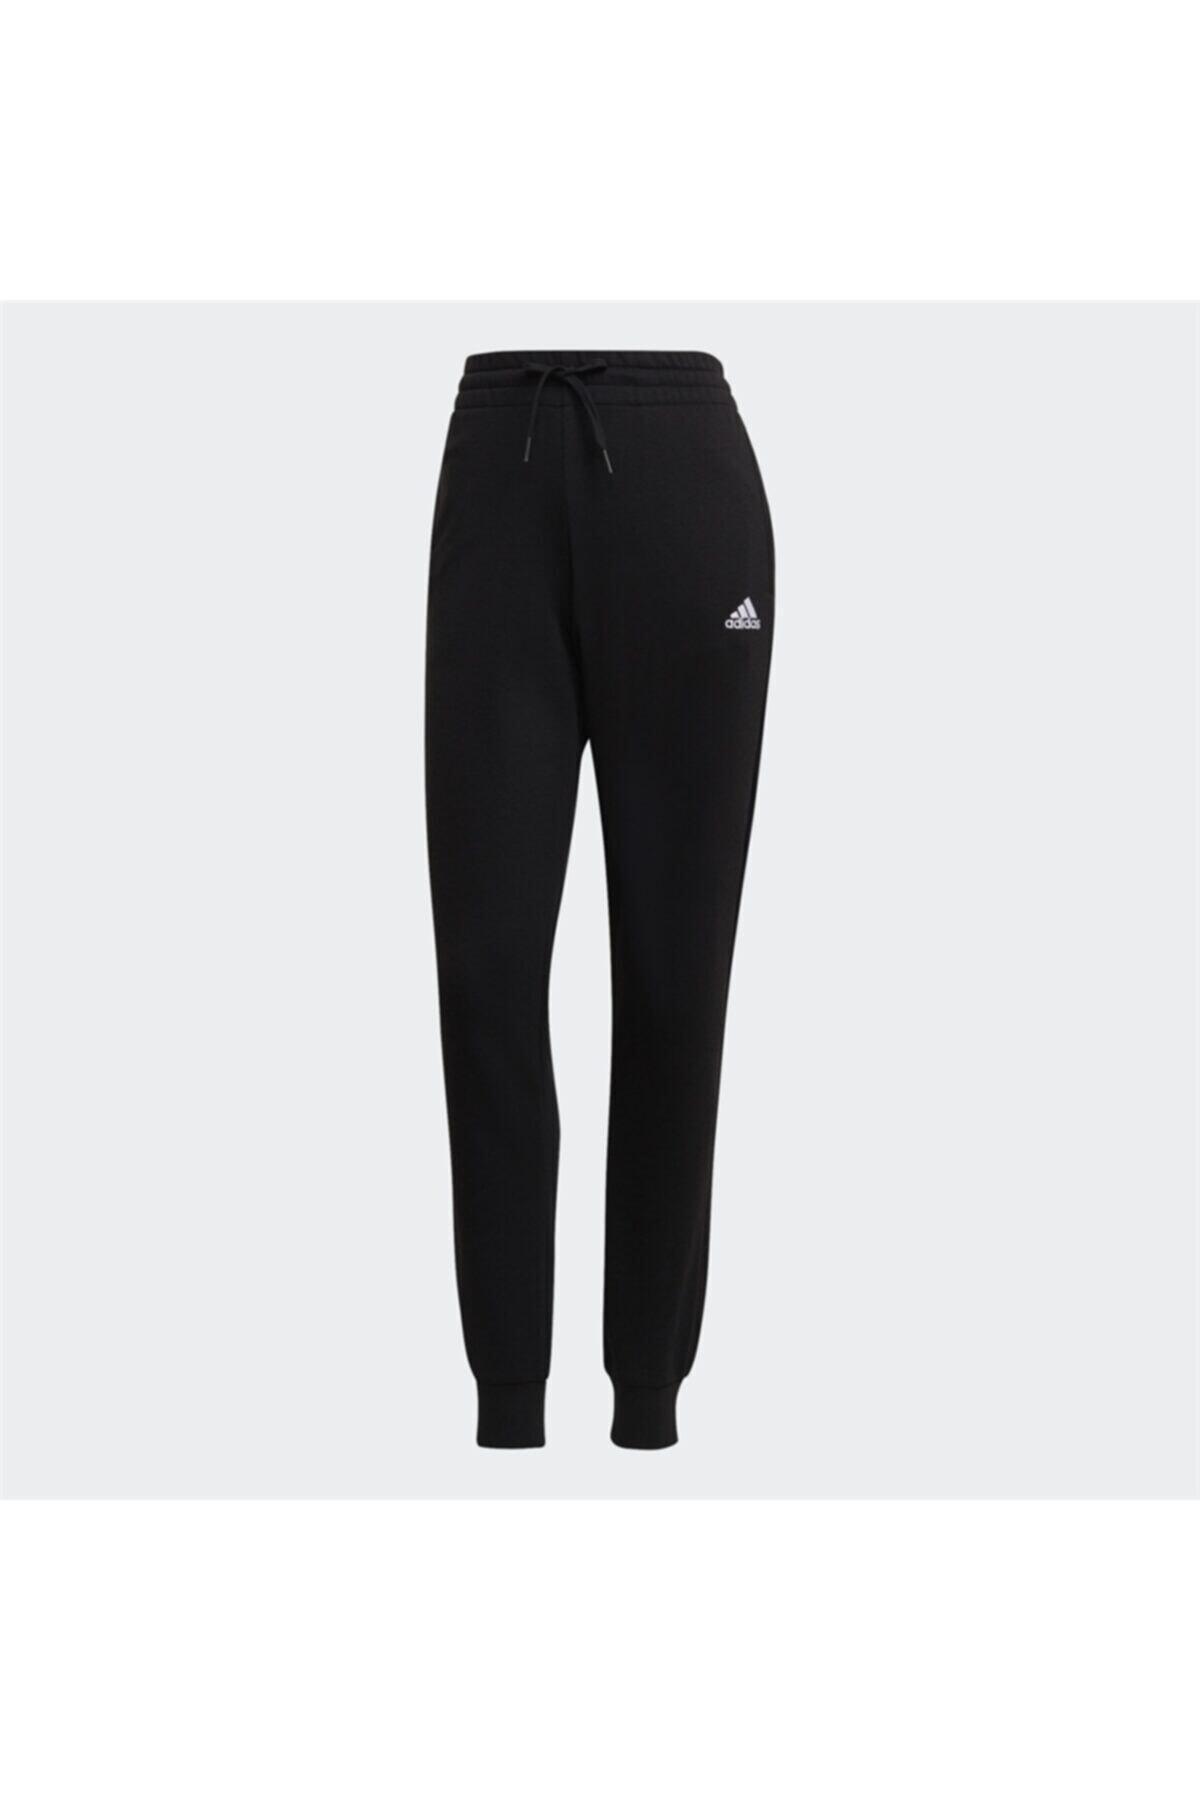 adidas Kadın Siyah Beyaz W Lın Ft C Pt Spor Eşofman Altı 2